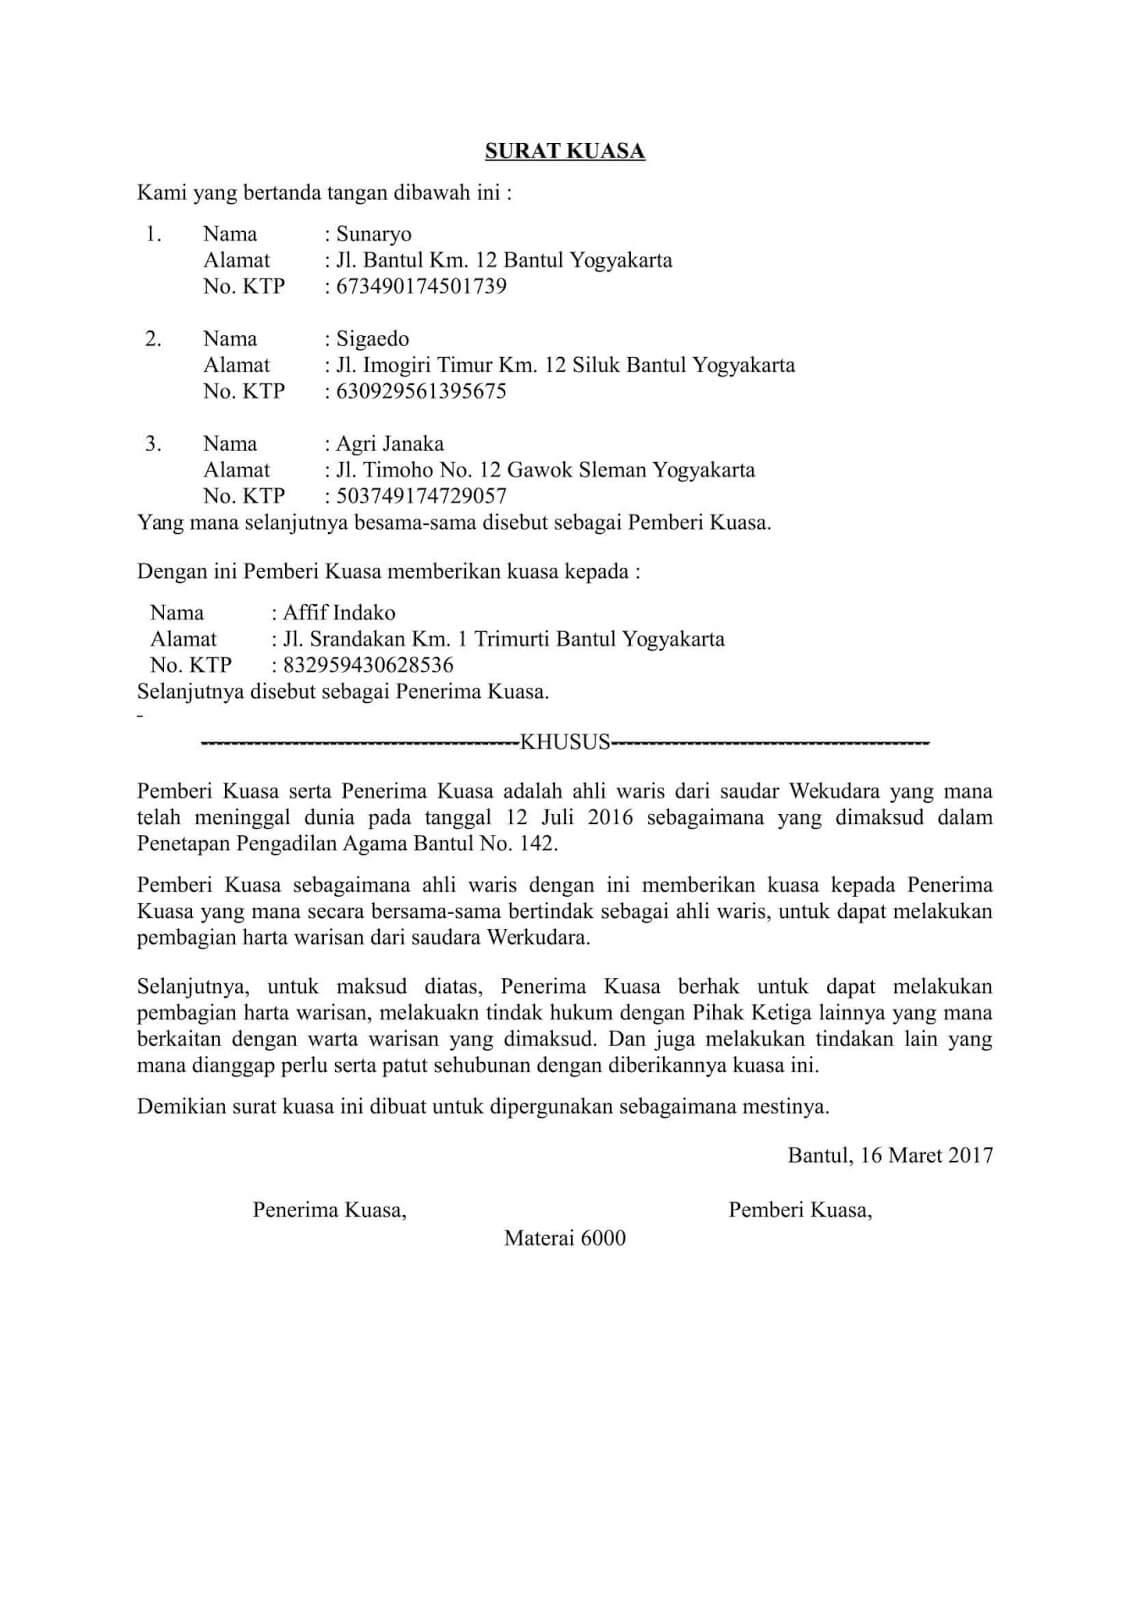 15+ Contoh Surat Keterangan Ahli Waris & Akta Waris Lengkap